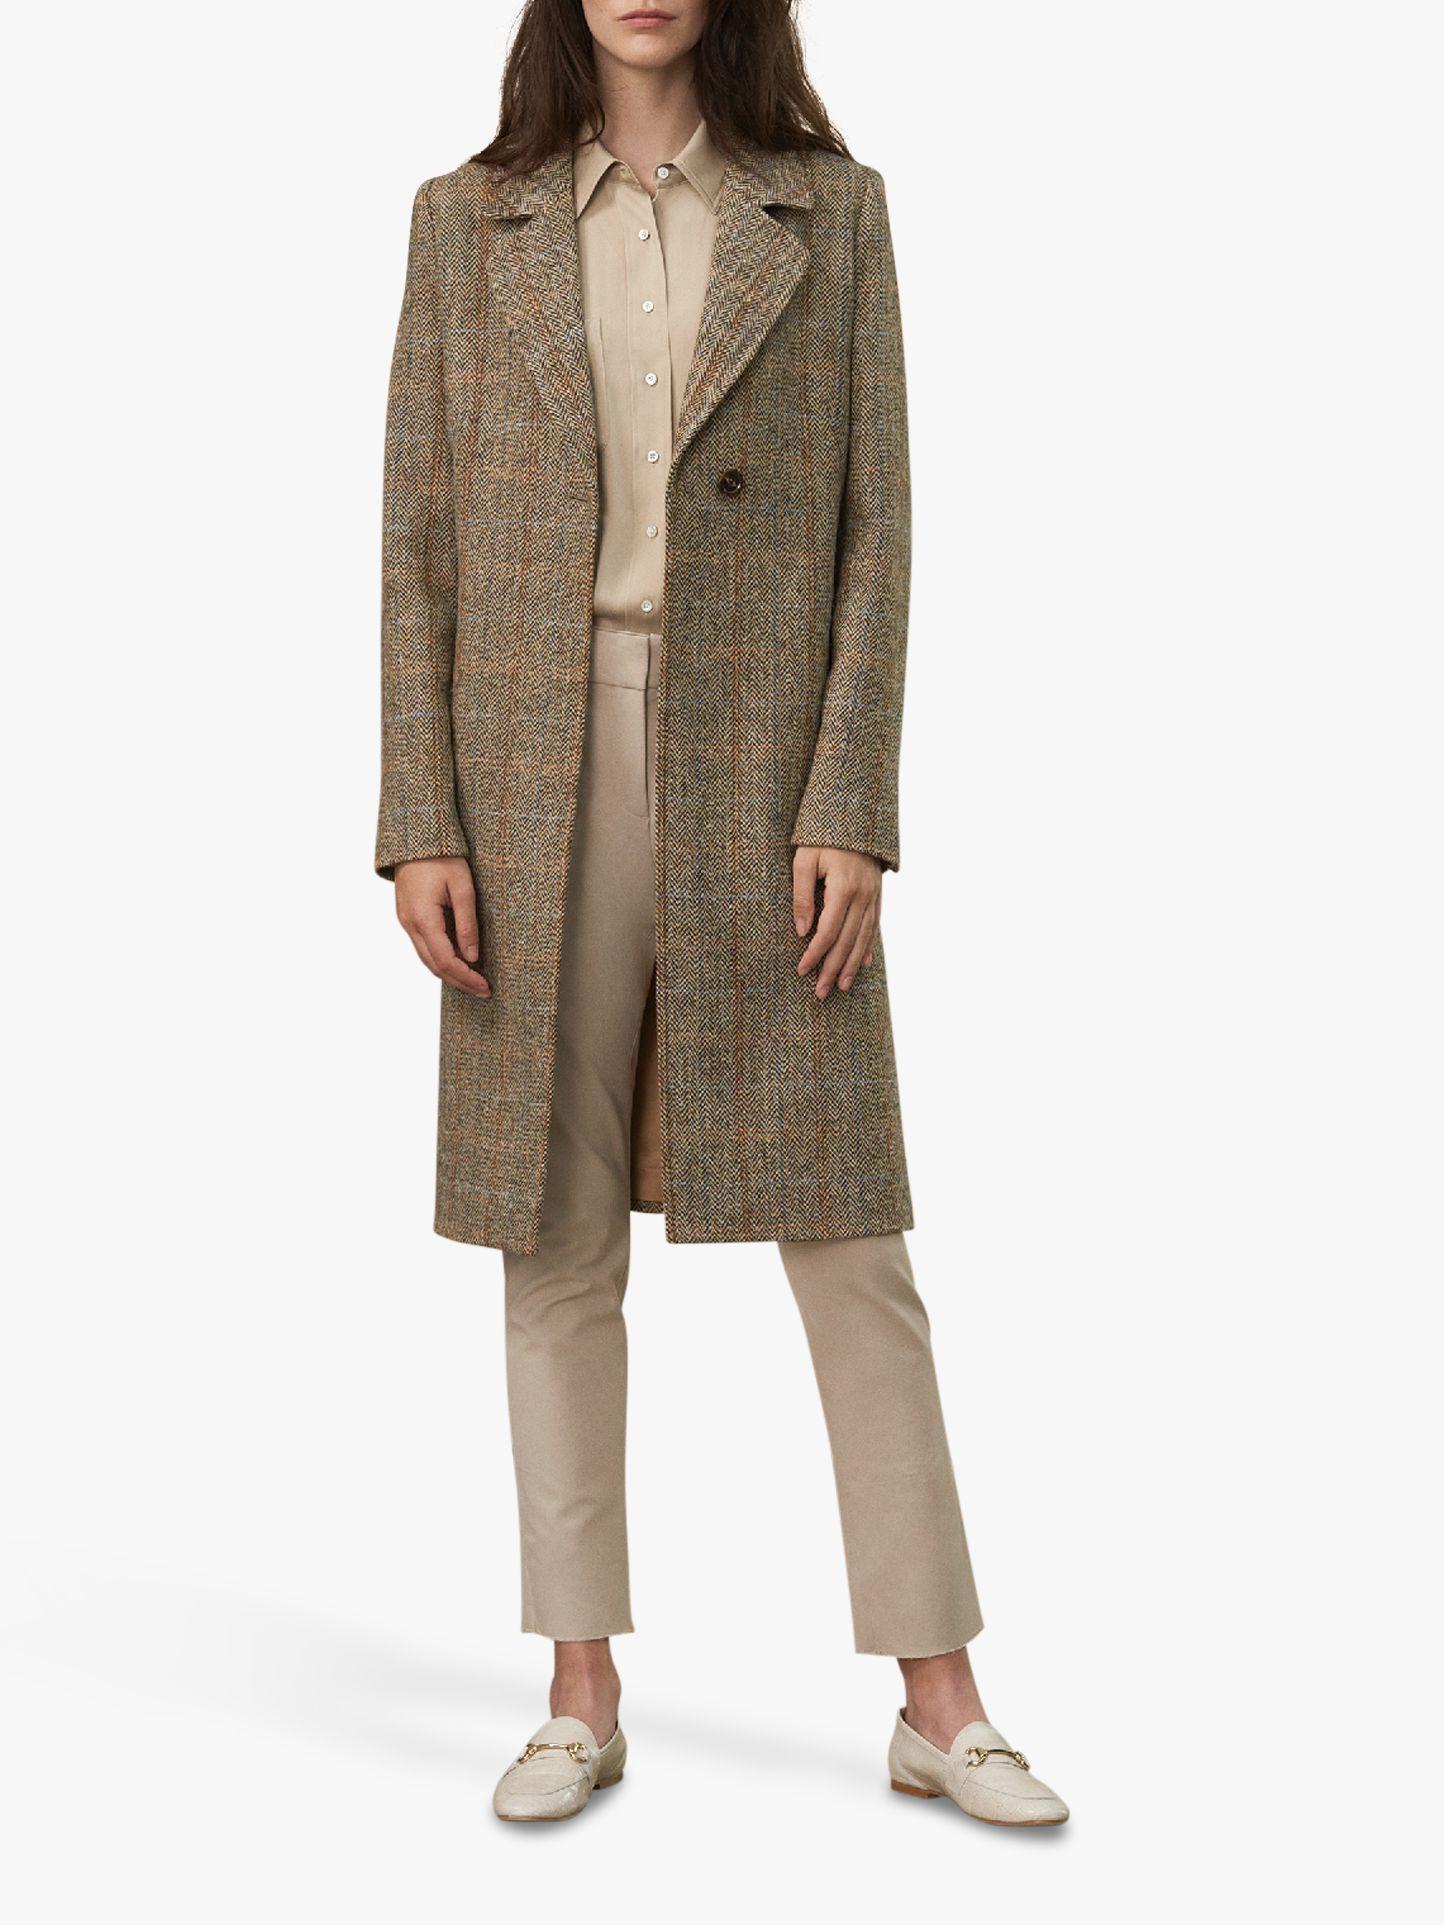 Winser London Winser London British Harris Tweed Coat, Brown